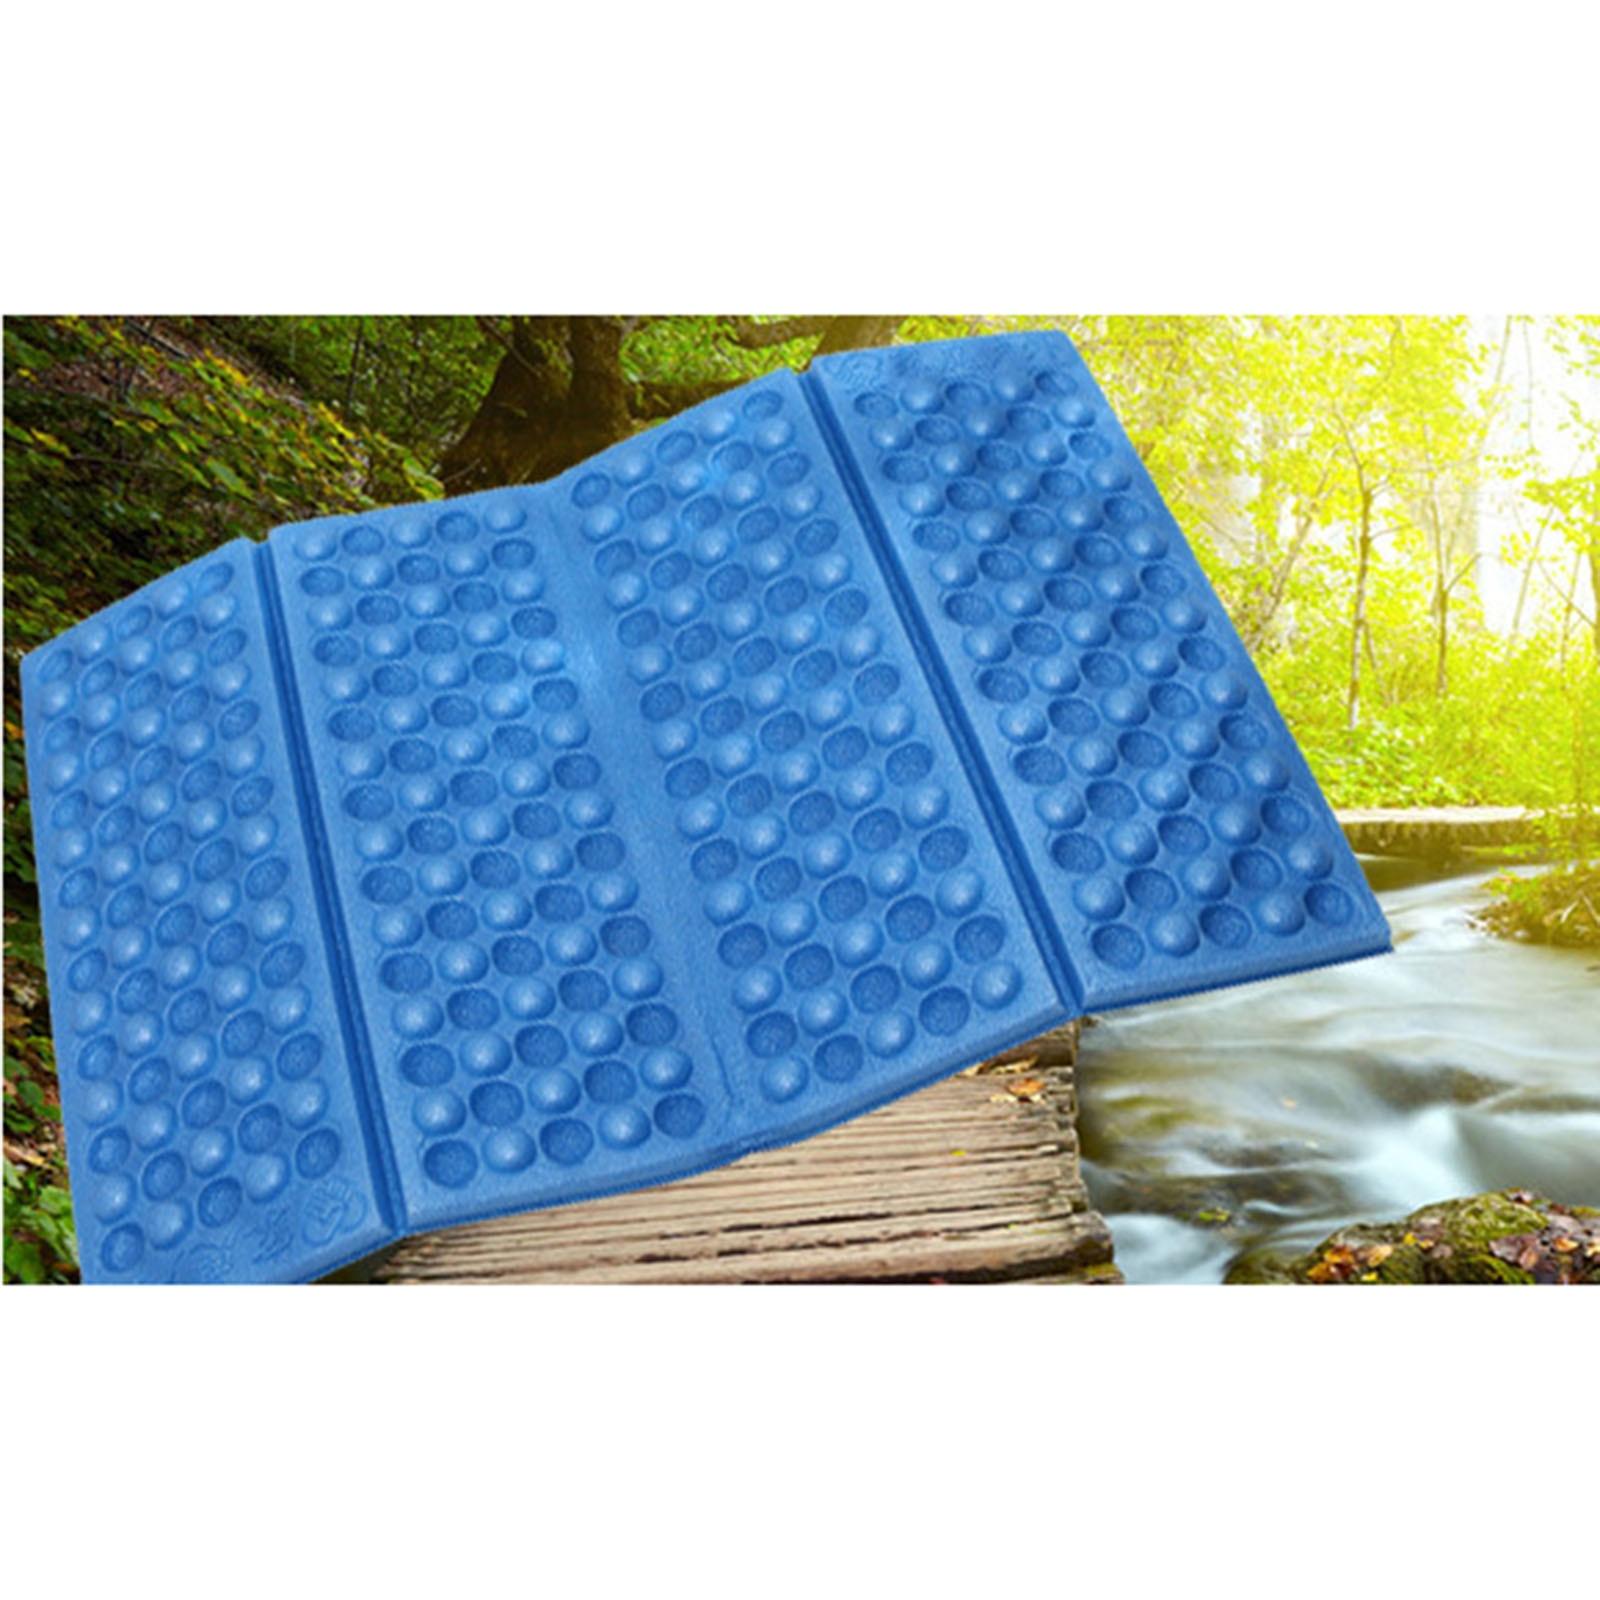 eva foam outdoor foldable eggcrate seat cushion eva chair pad